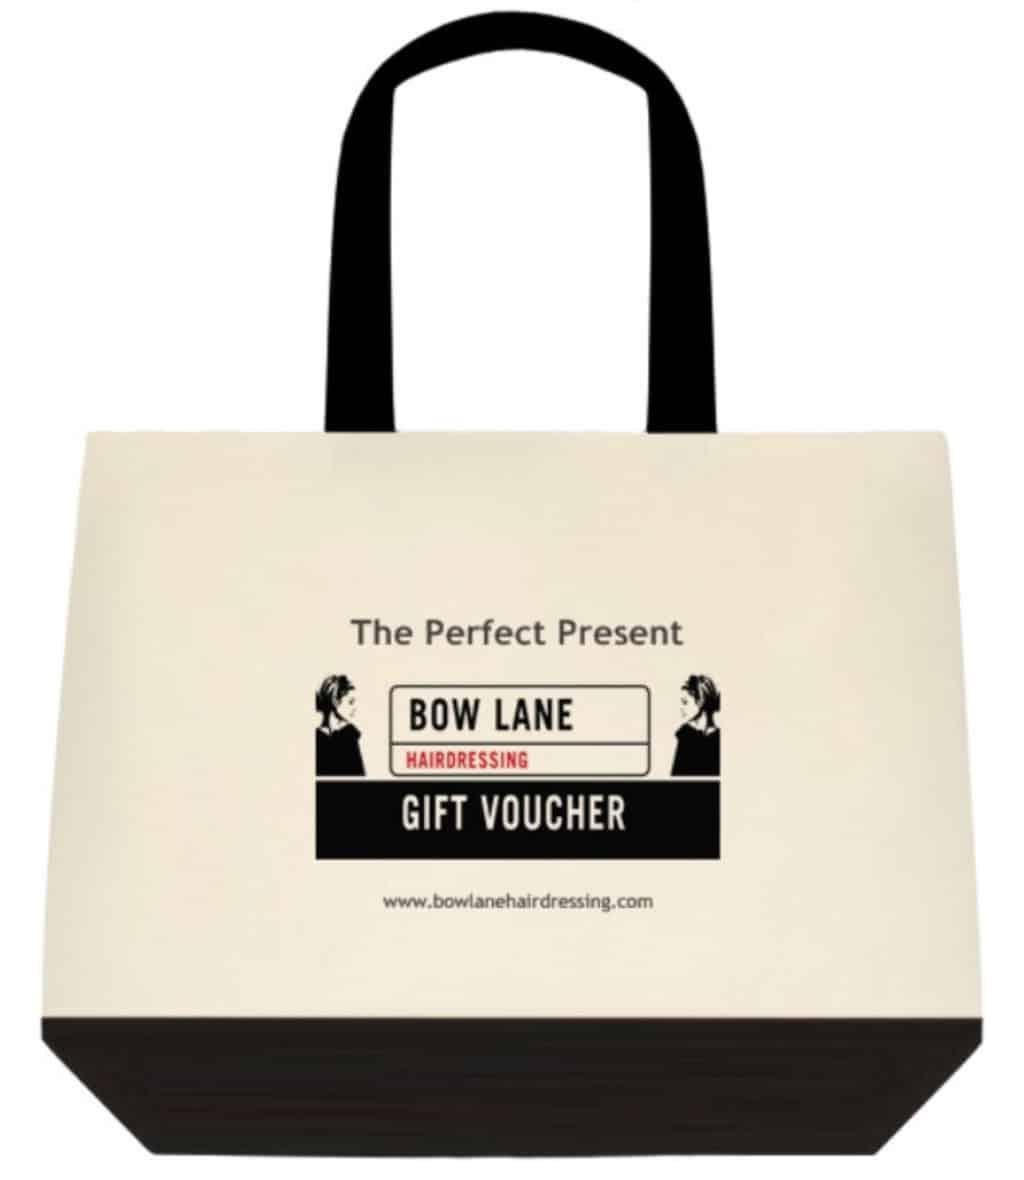 Bow Lane Hairdressing promotional bag